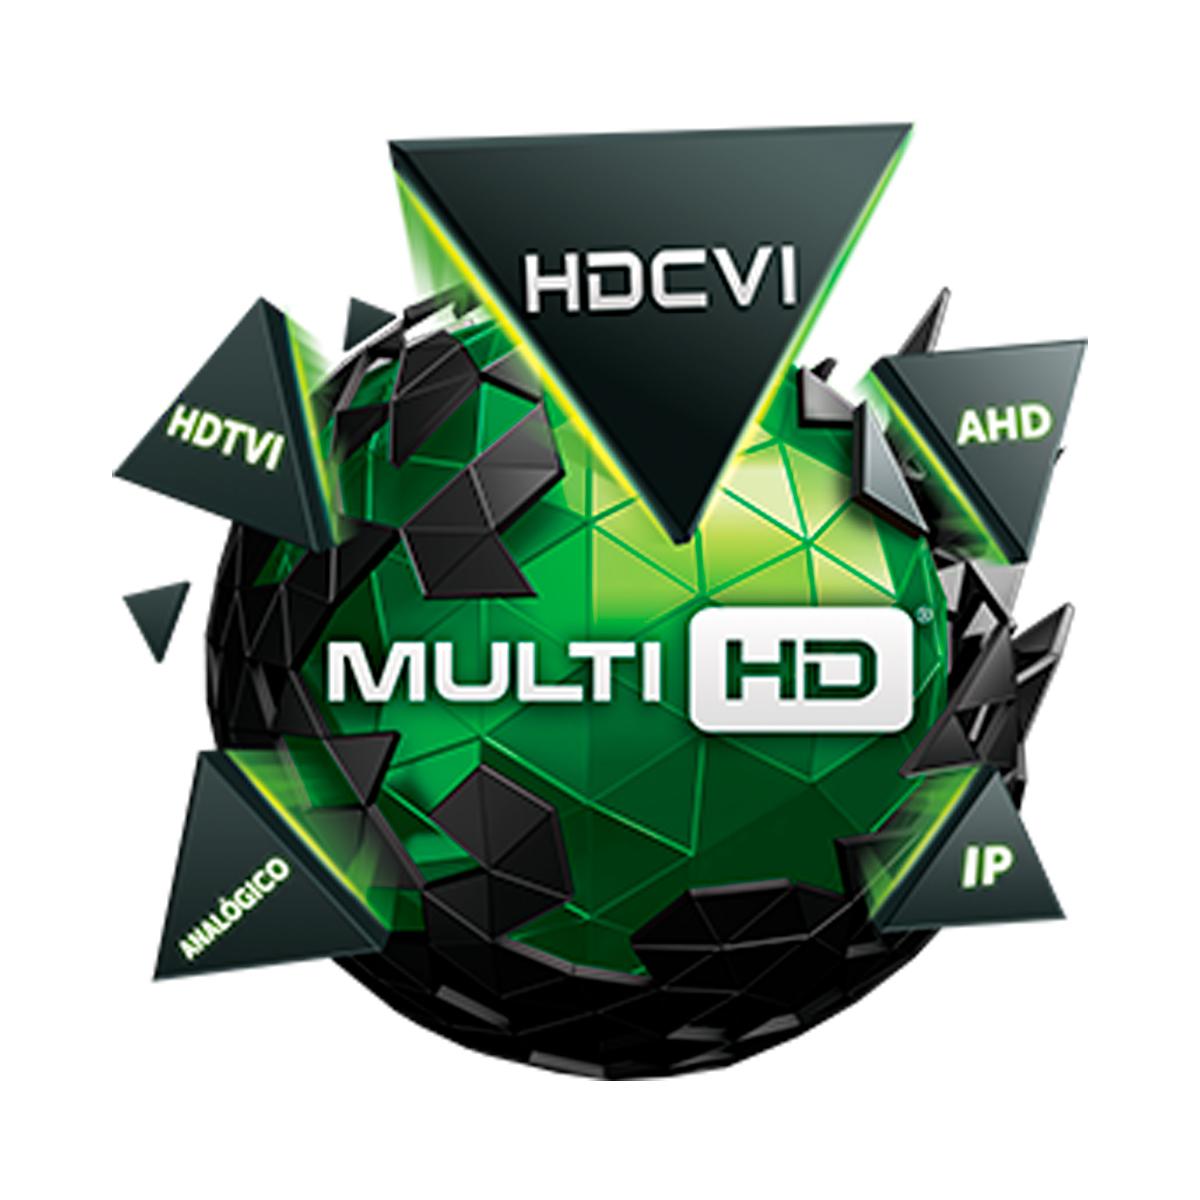 dvr-stand-alone-multi-hd-intelbras-mhd-1104-de-4-canais-1080p-lite-1-canal-2mp-ip-01